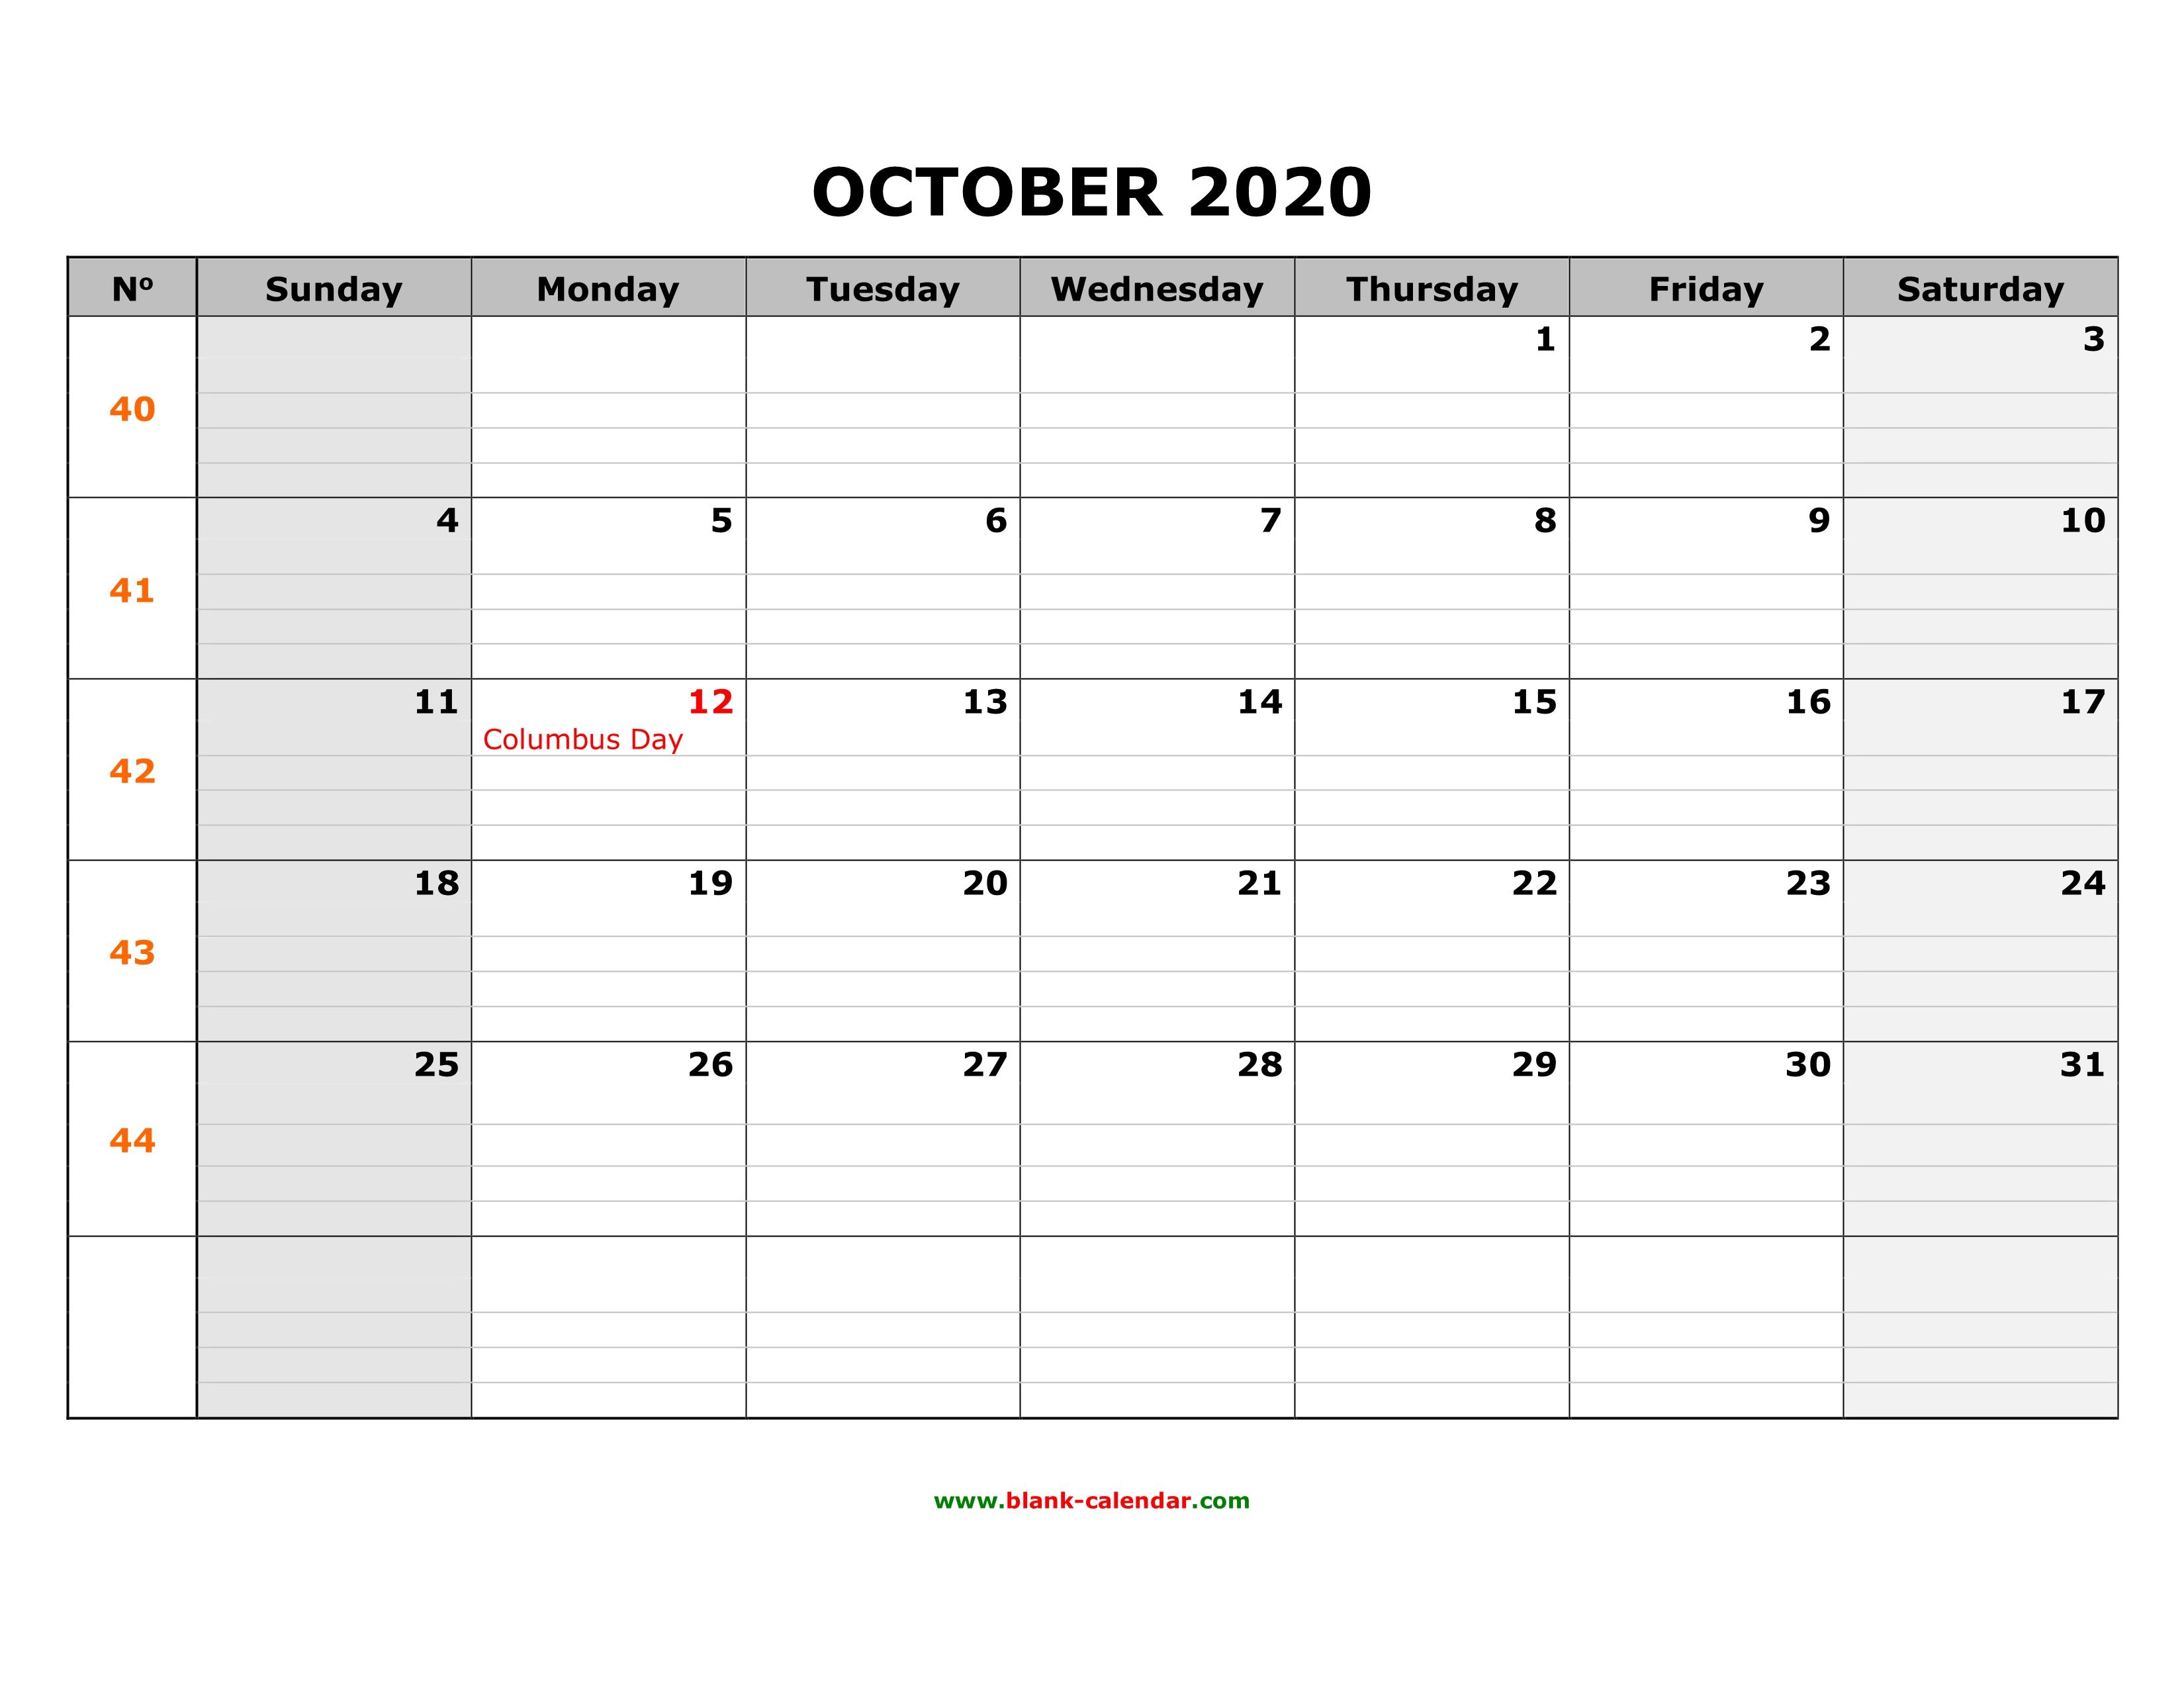 October 2020 Printable Calendar.Free Download Printable October 2020 Calendar Large Box Grid Space